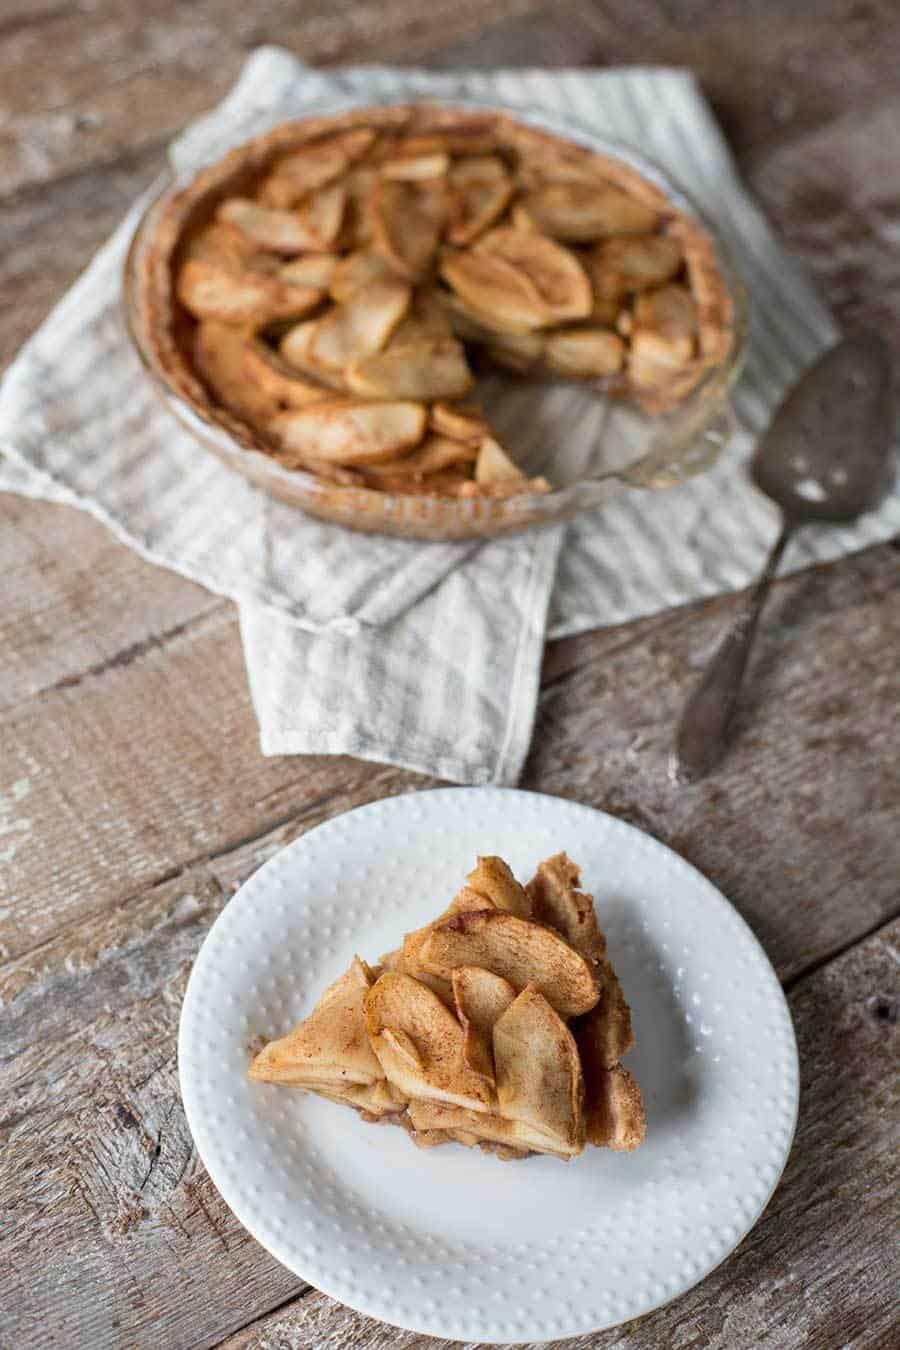 Slice of paleo apple pie